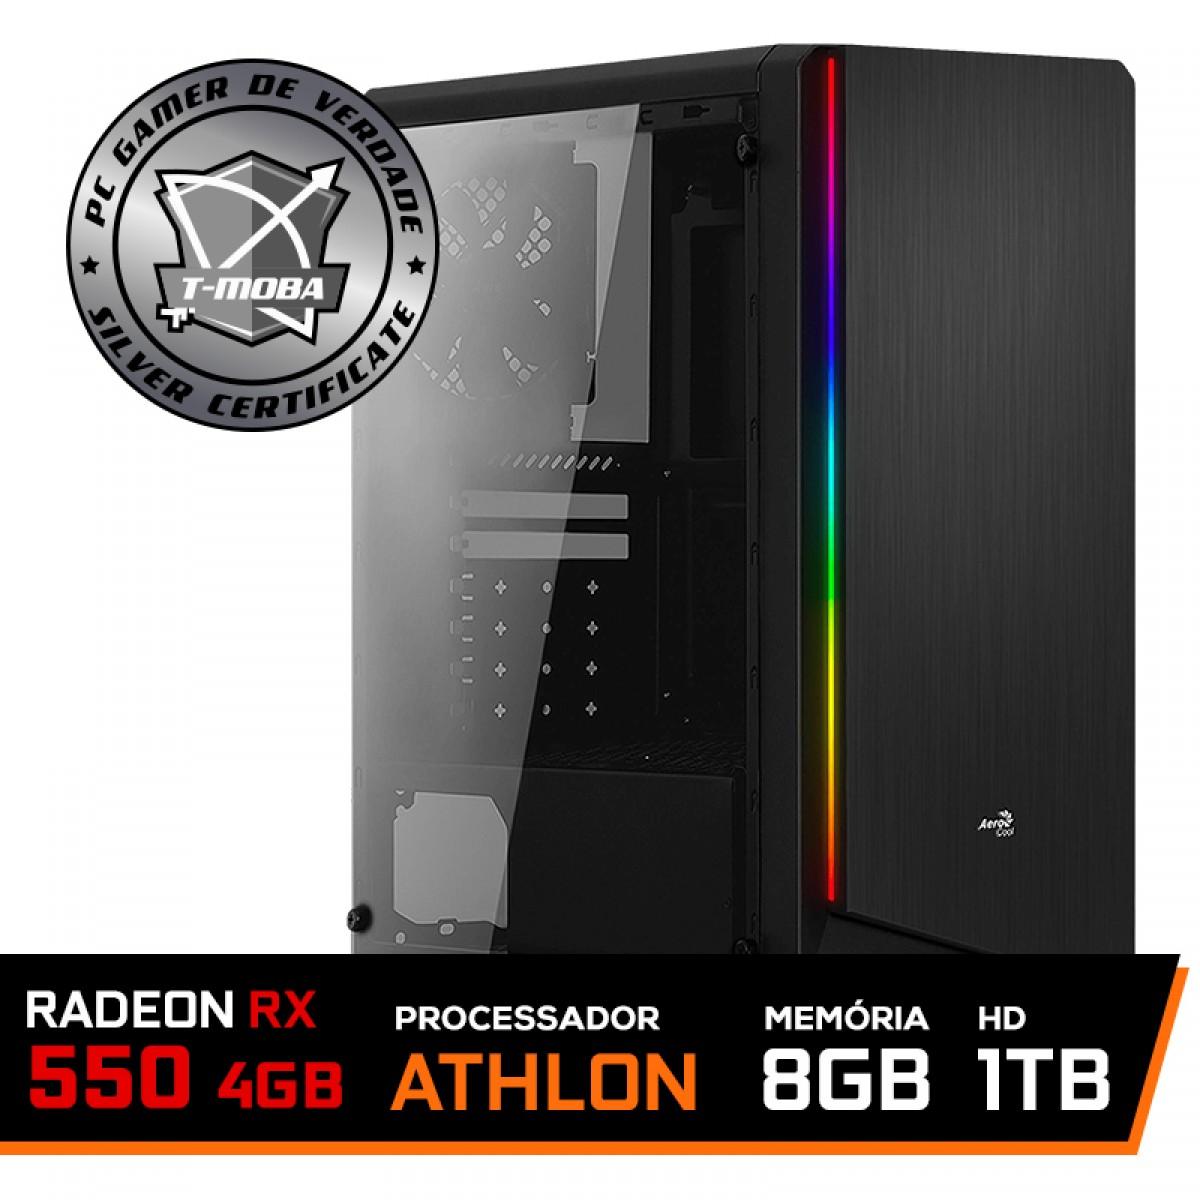 Pc Gamer T-moba Furious LVL-4 AMD Athlon 200GE / Radeon Rx 550 4GB / DDR4 8GB / HD 1TB